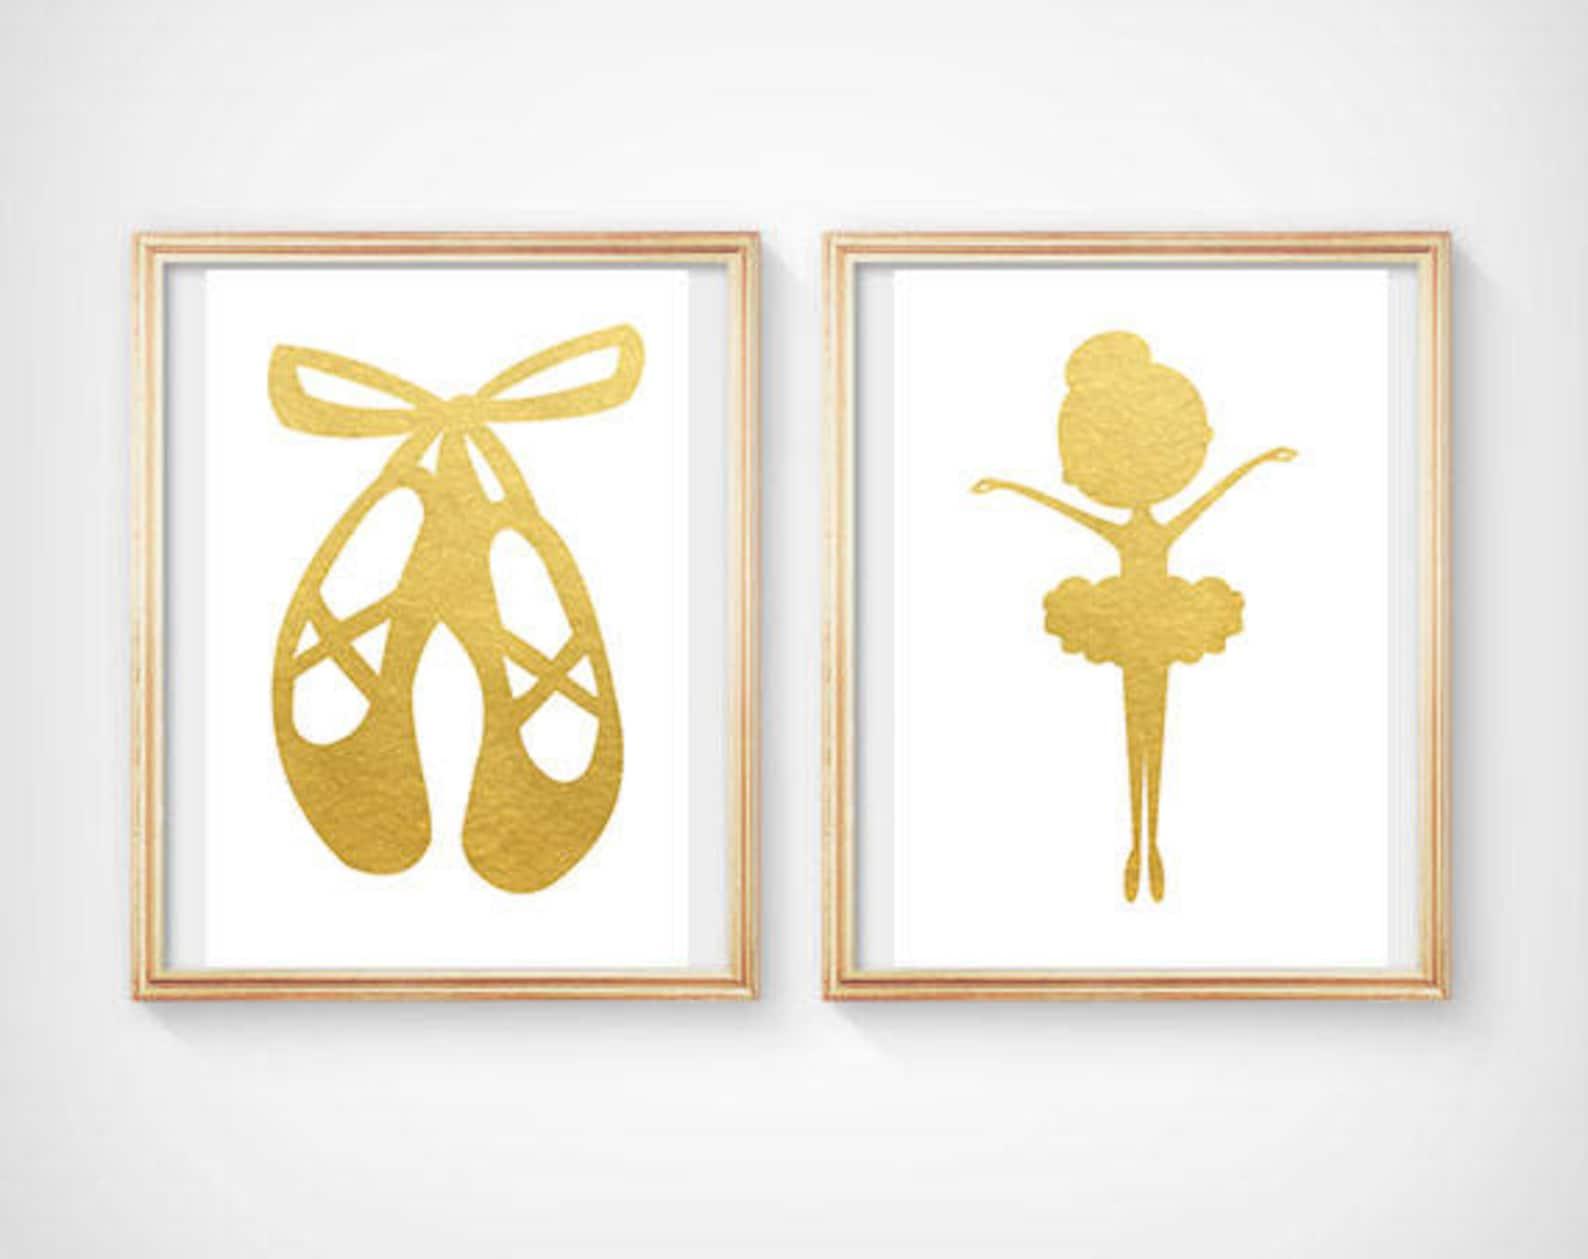 ballet shoes print ballet wall decor gold ballet shoes poster ballerina wall decor ballerina dancer art ballerina decor ballerin